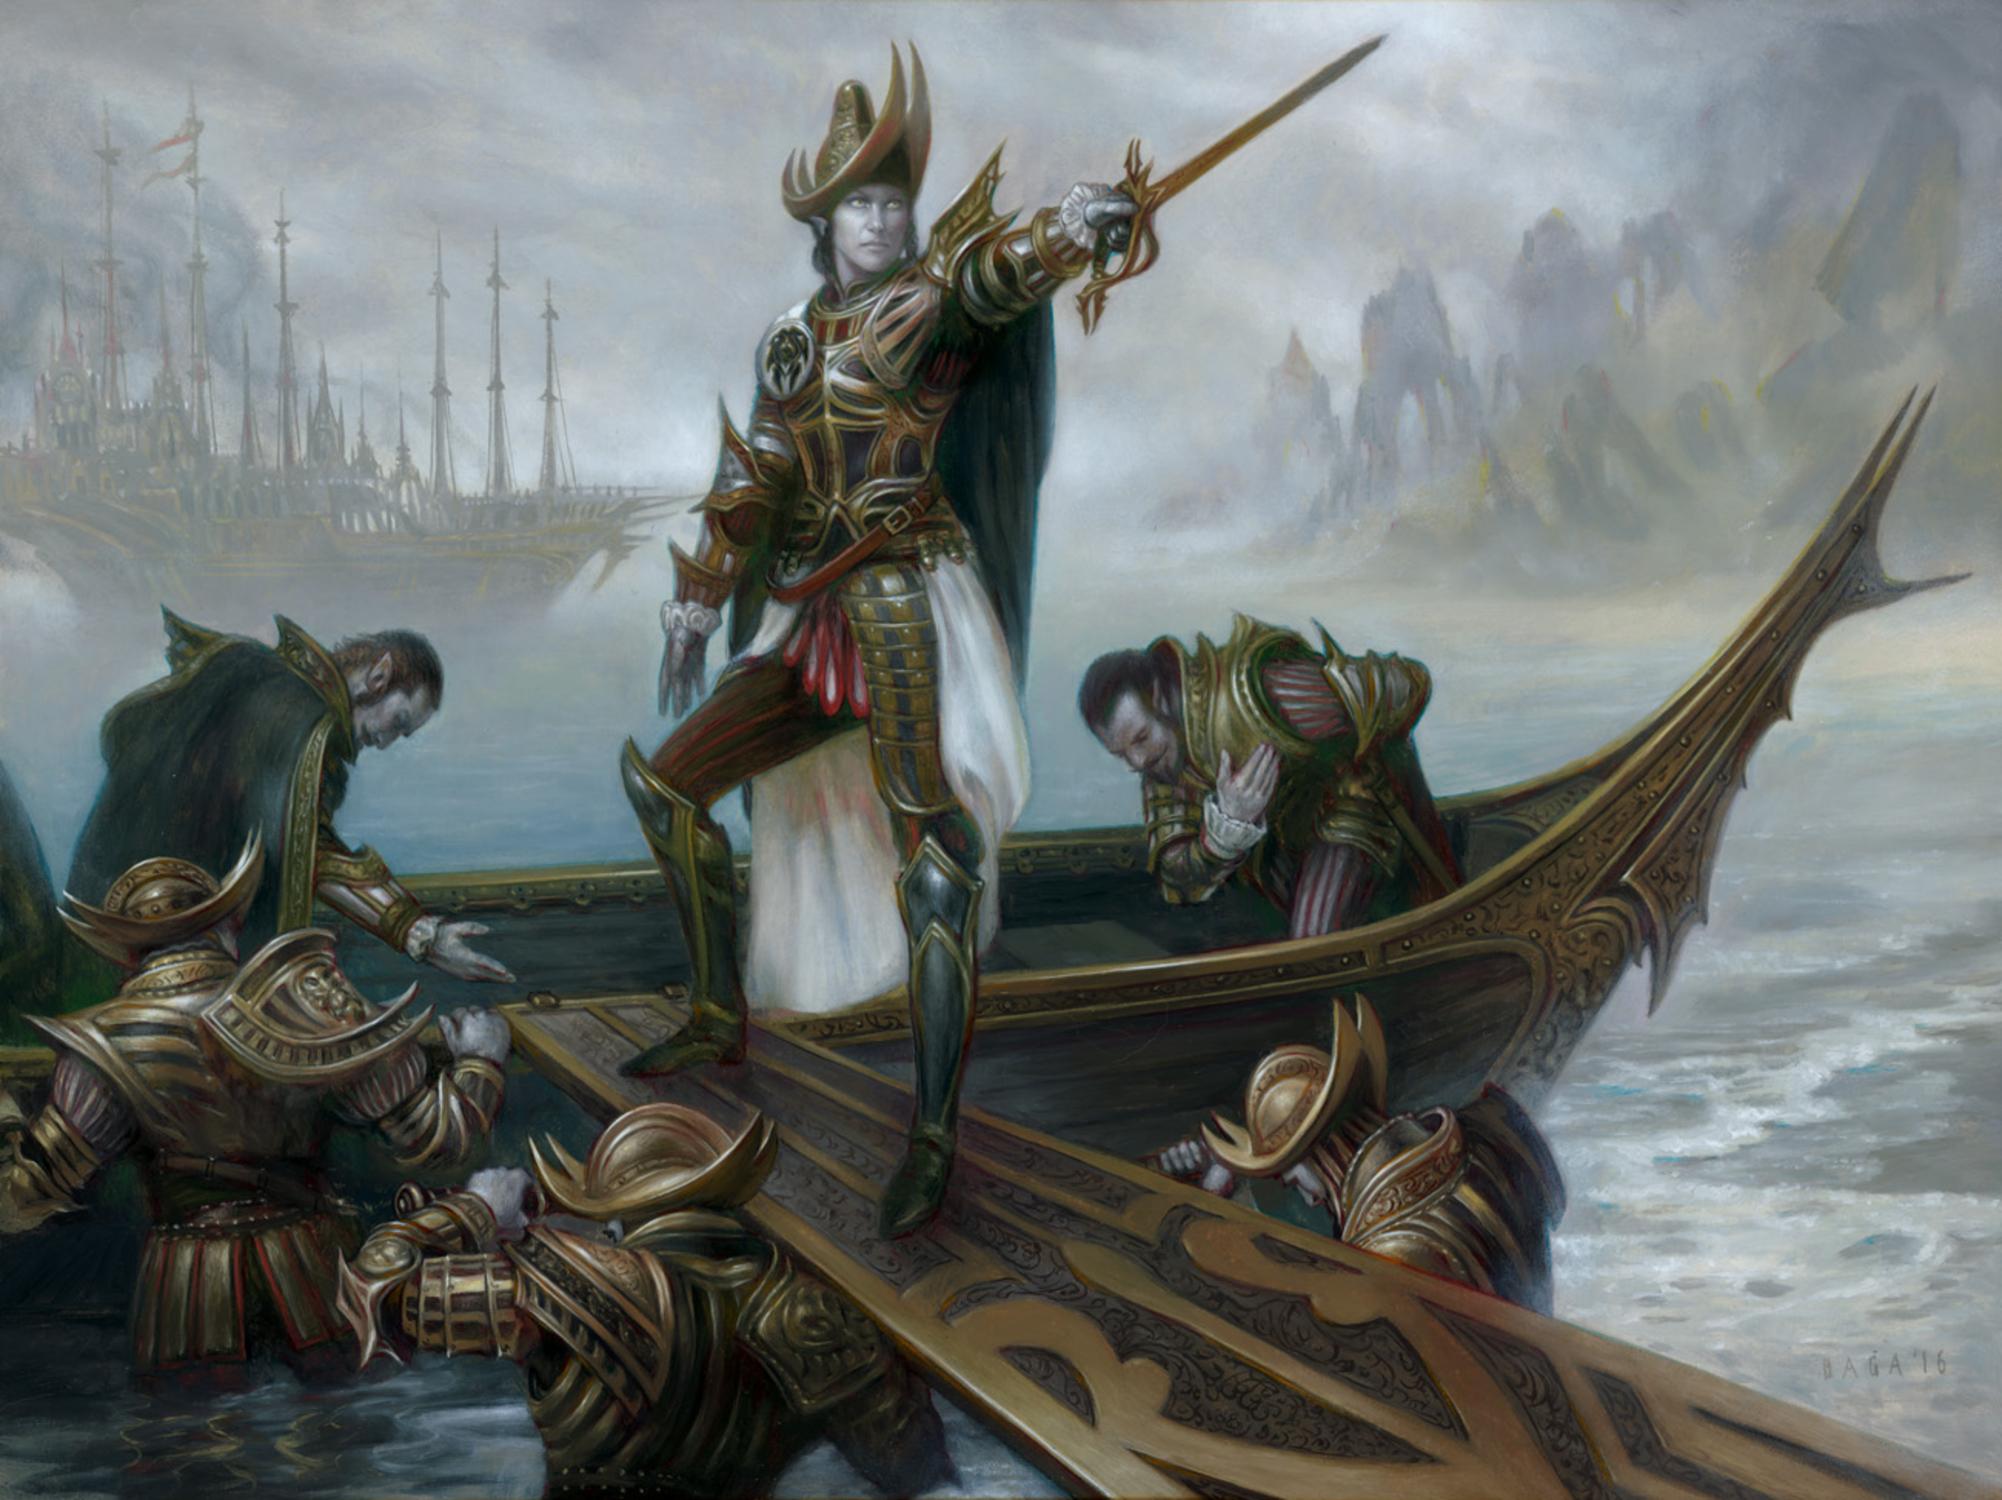 Vona, Butcher of Magan Artwork by Volkan Baga